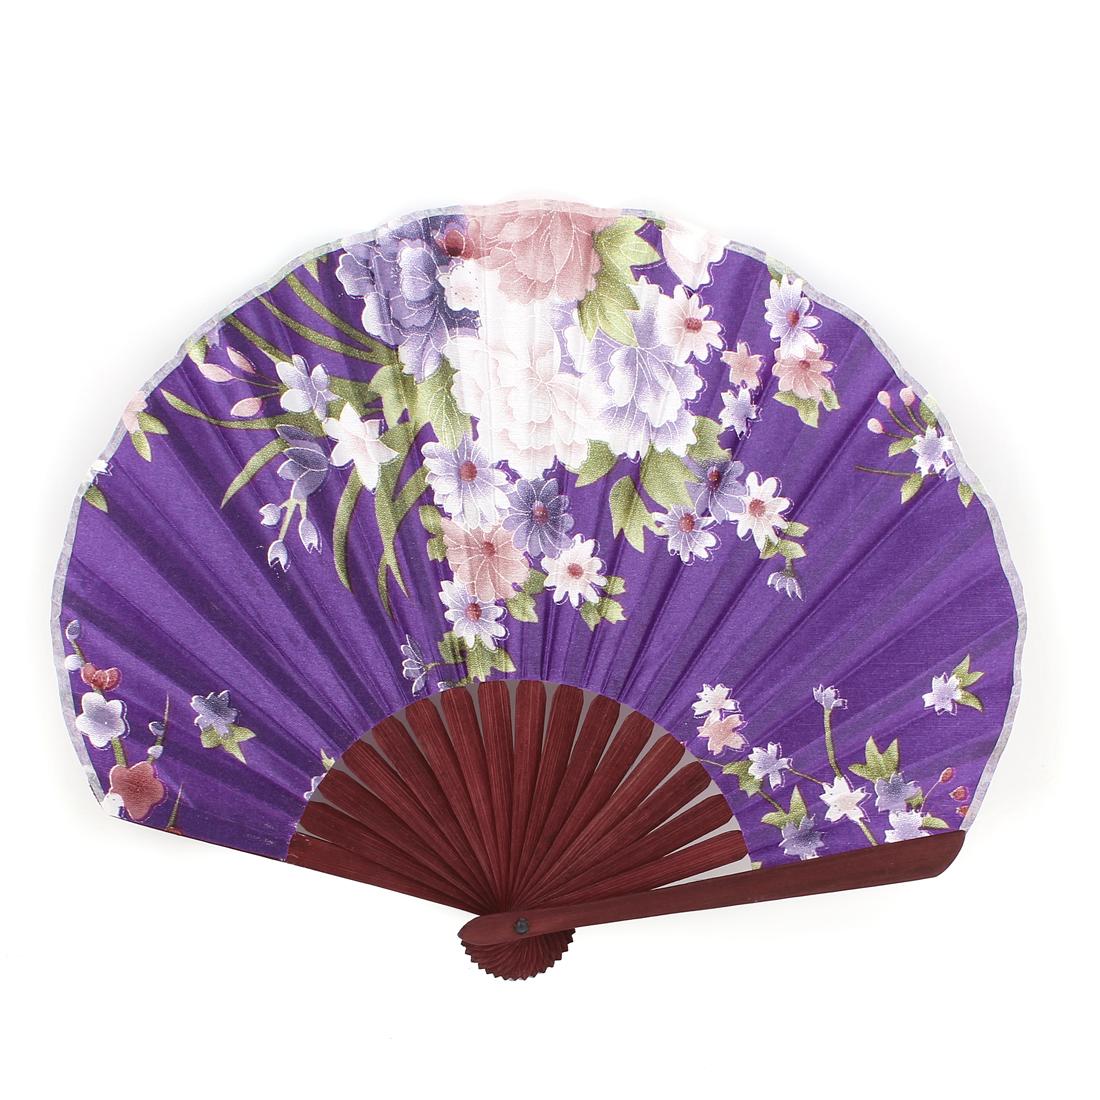 Seashell Shape Flower Print Chinese Style Wedding Party Folding Hand Fan Purple